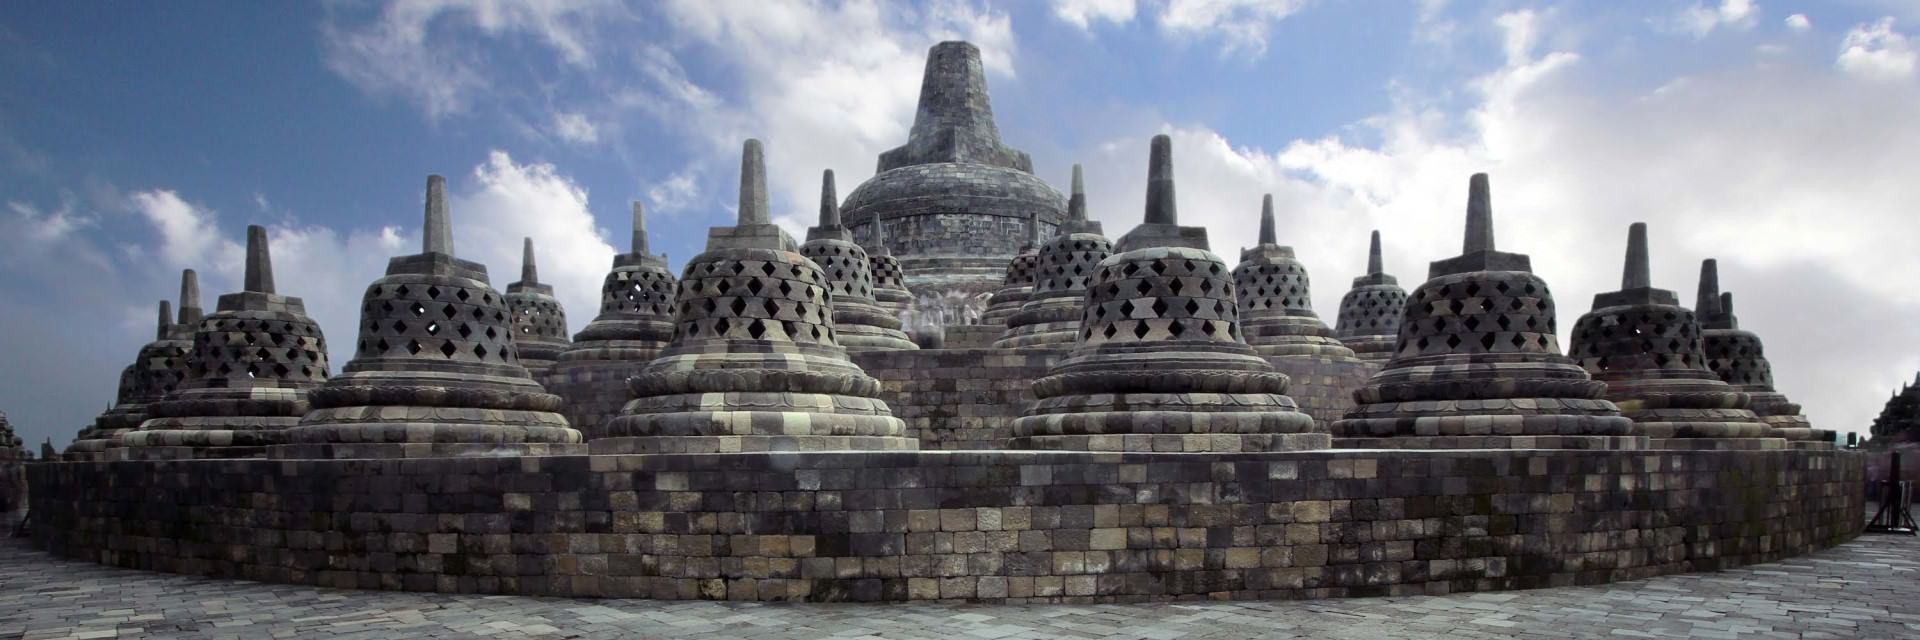 Selain Budaya, Kota Yogya Punya Sejarah. Yang Suka Hunting! Masuk, Masuk~